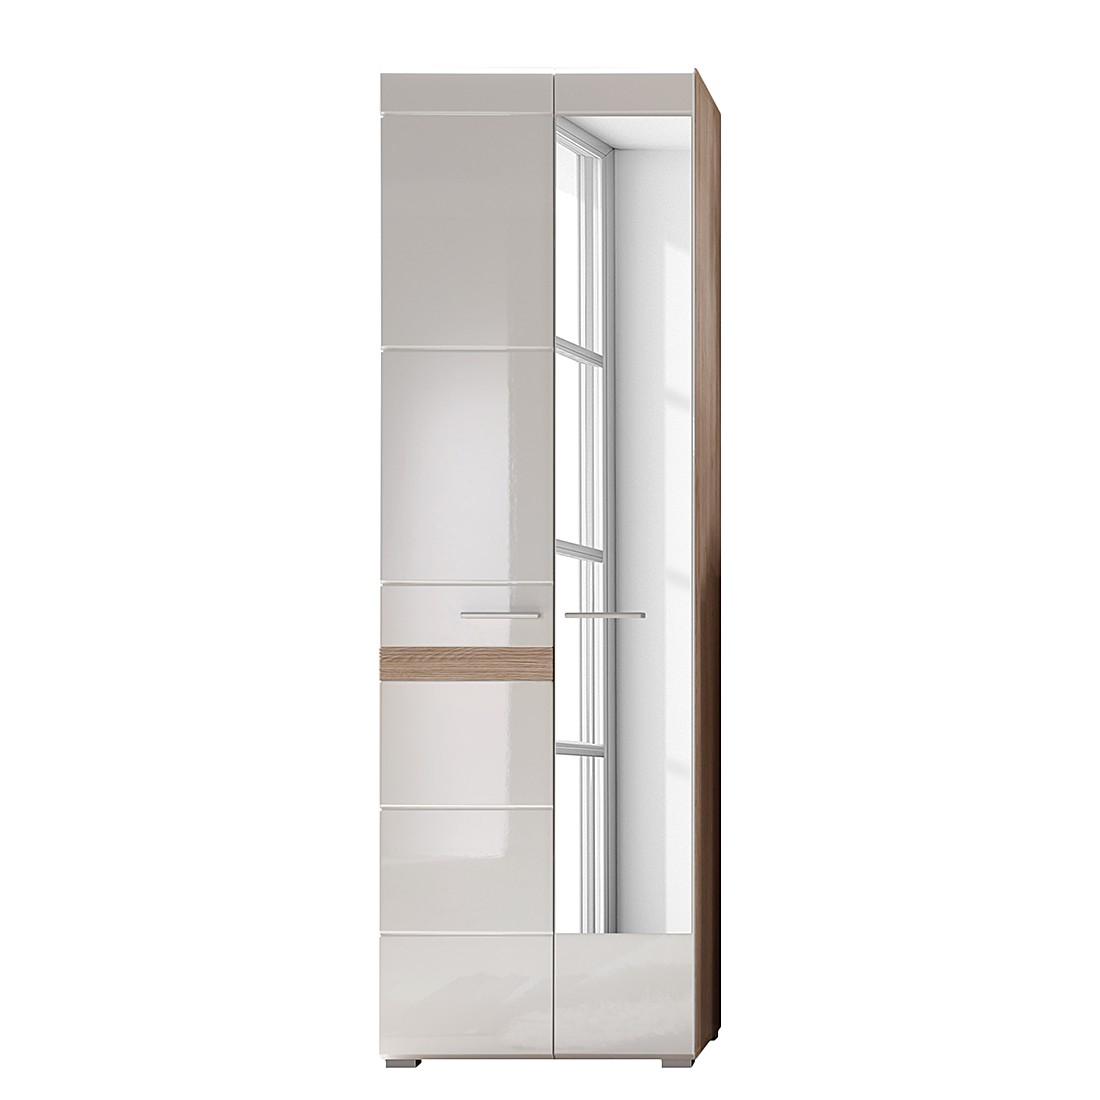 Home 24 - Armoire de vestibule baku - blanc brillant / imitation chêne de san remo, trendteam